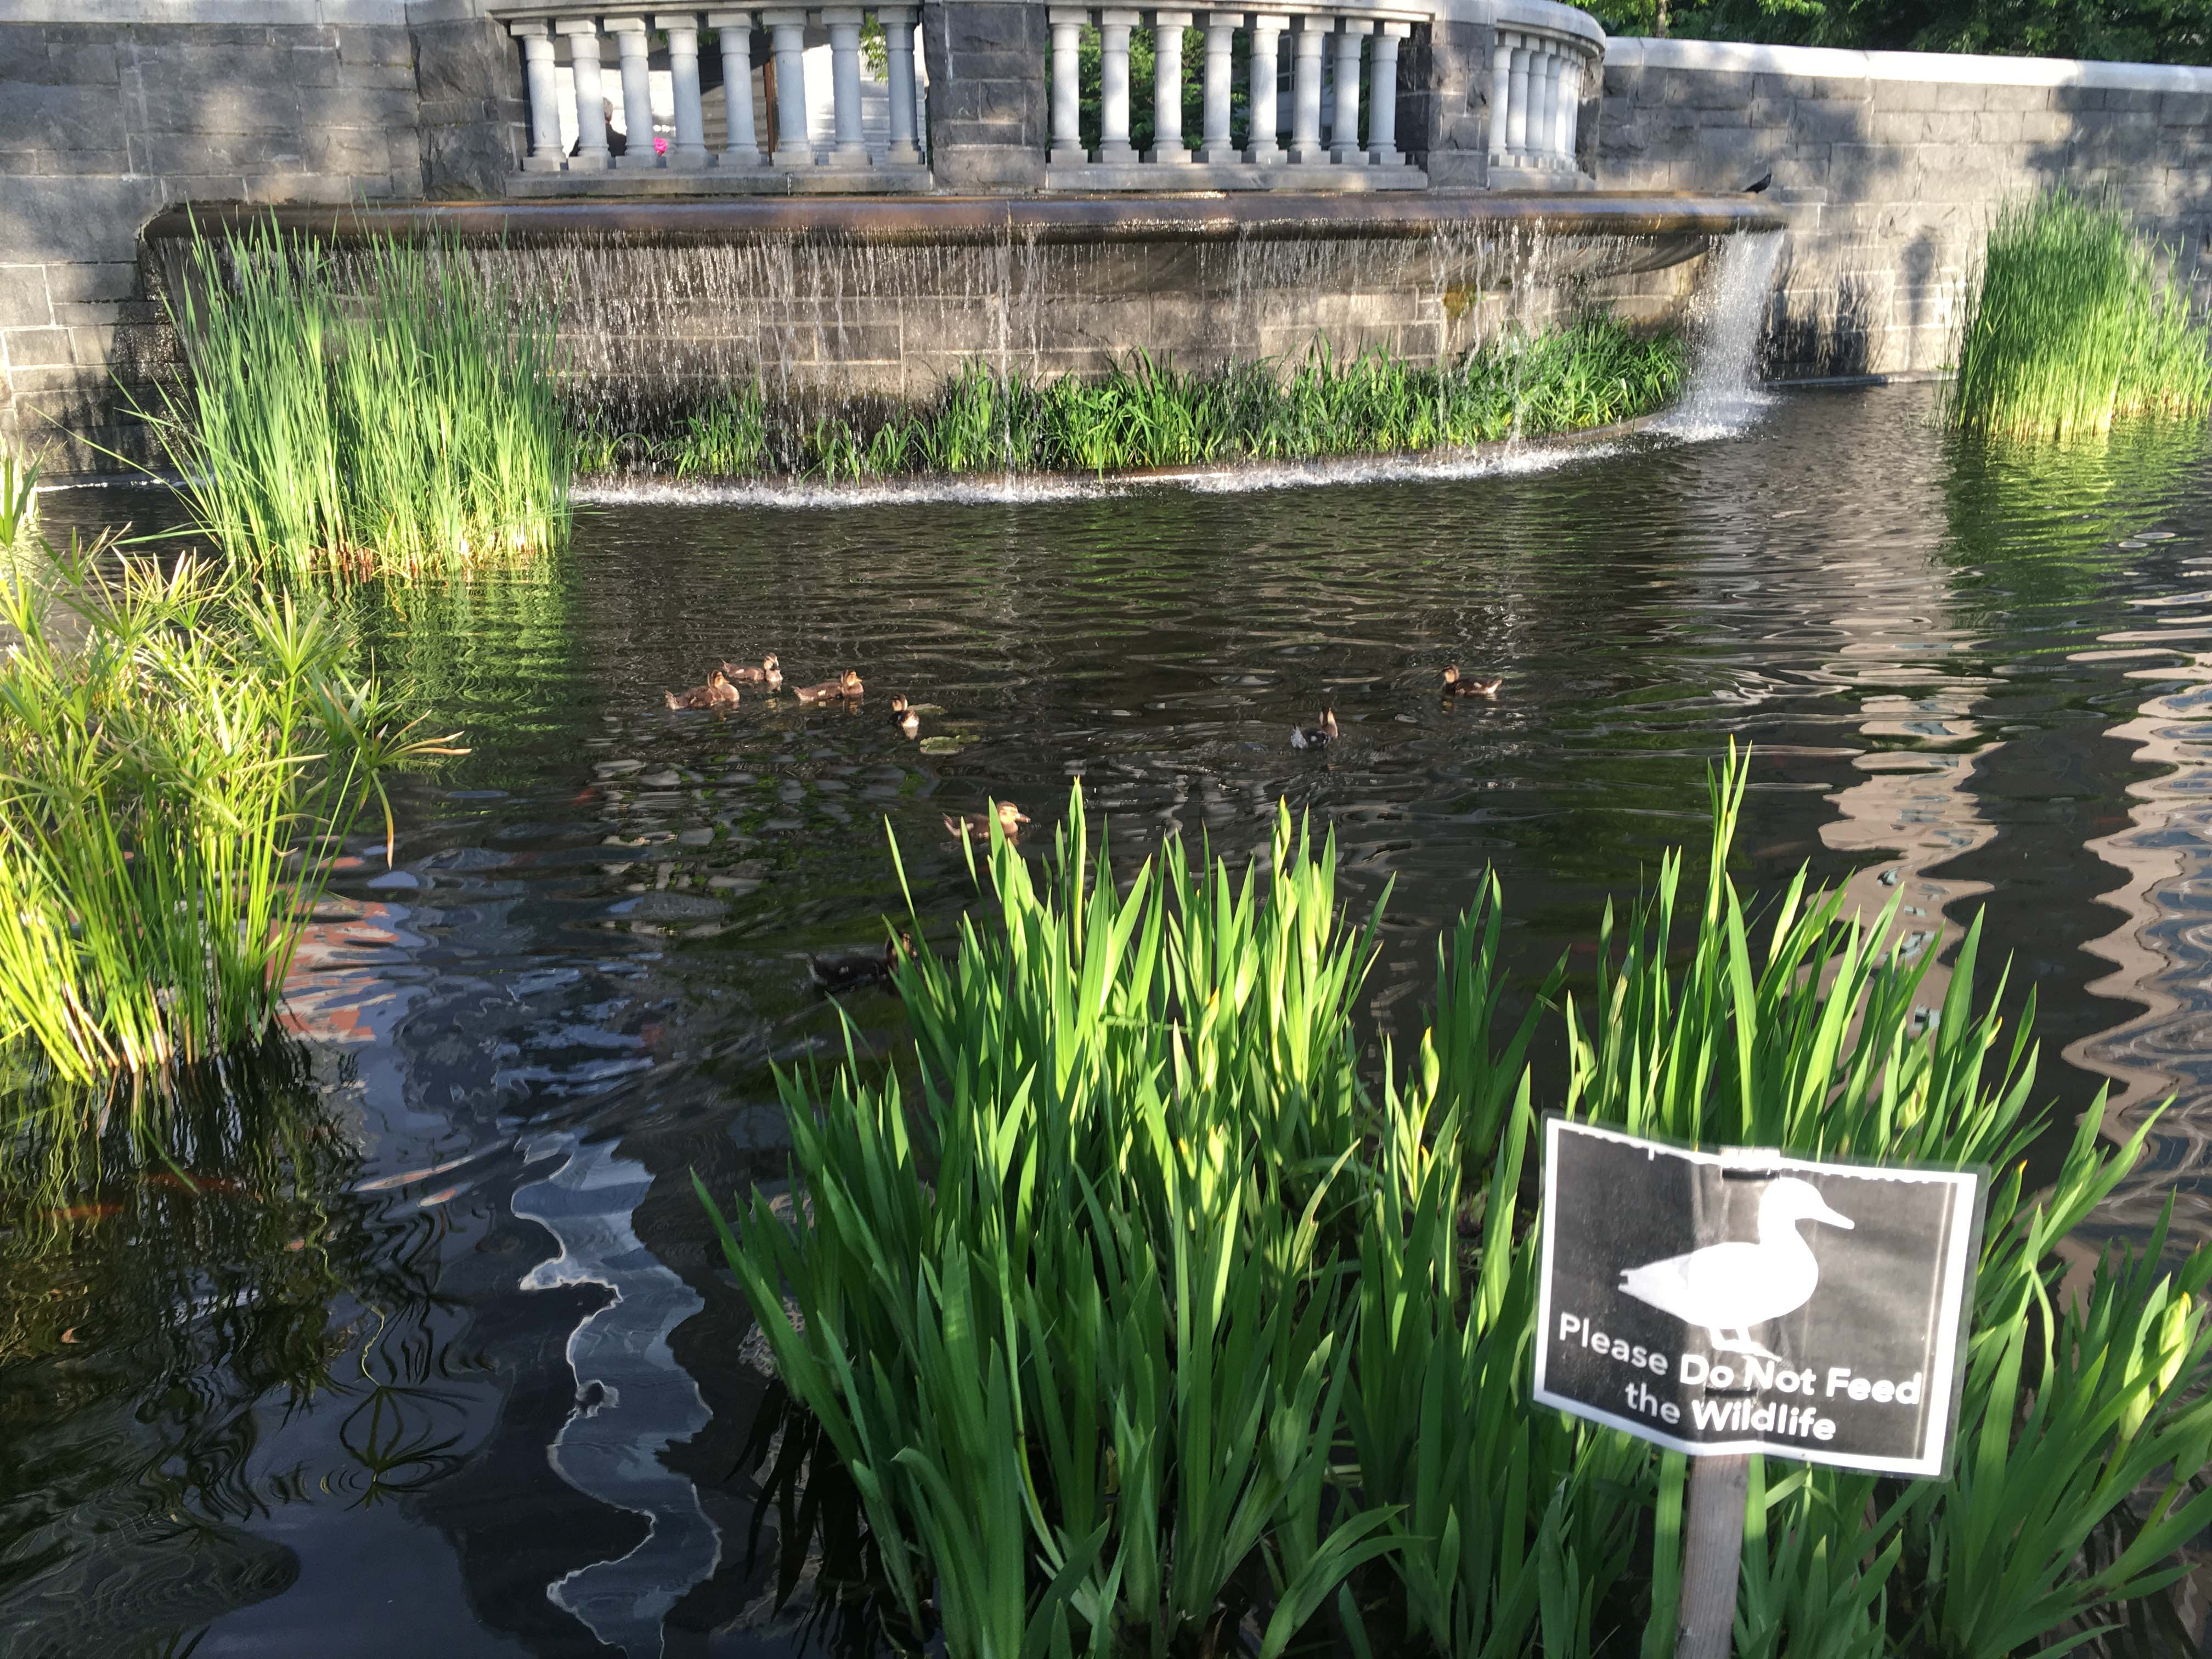 do not feed ducks sign